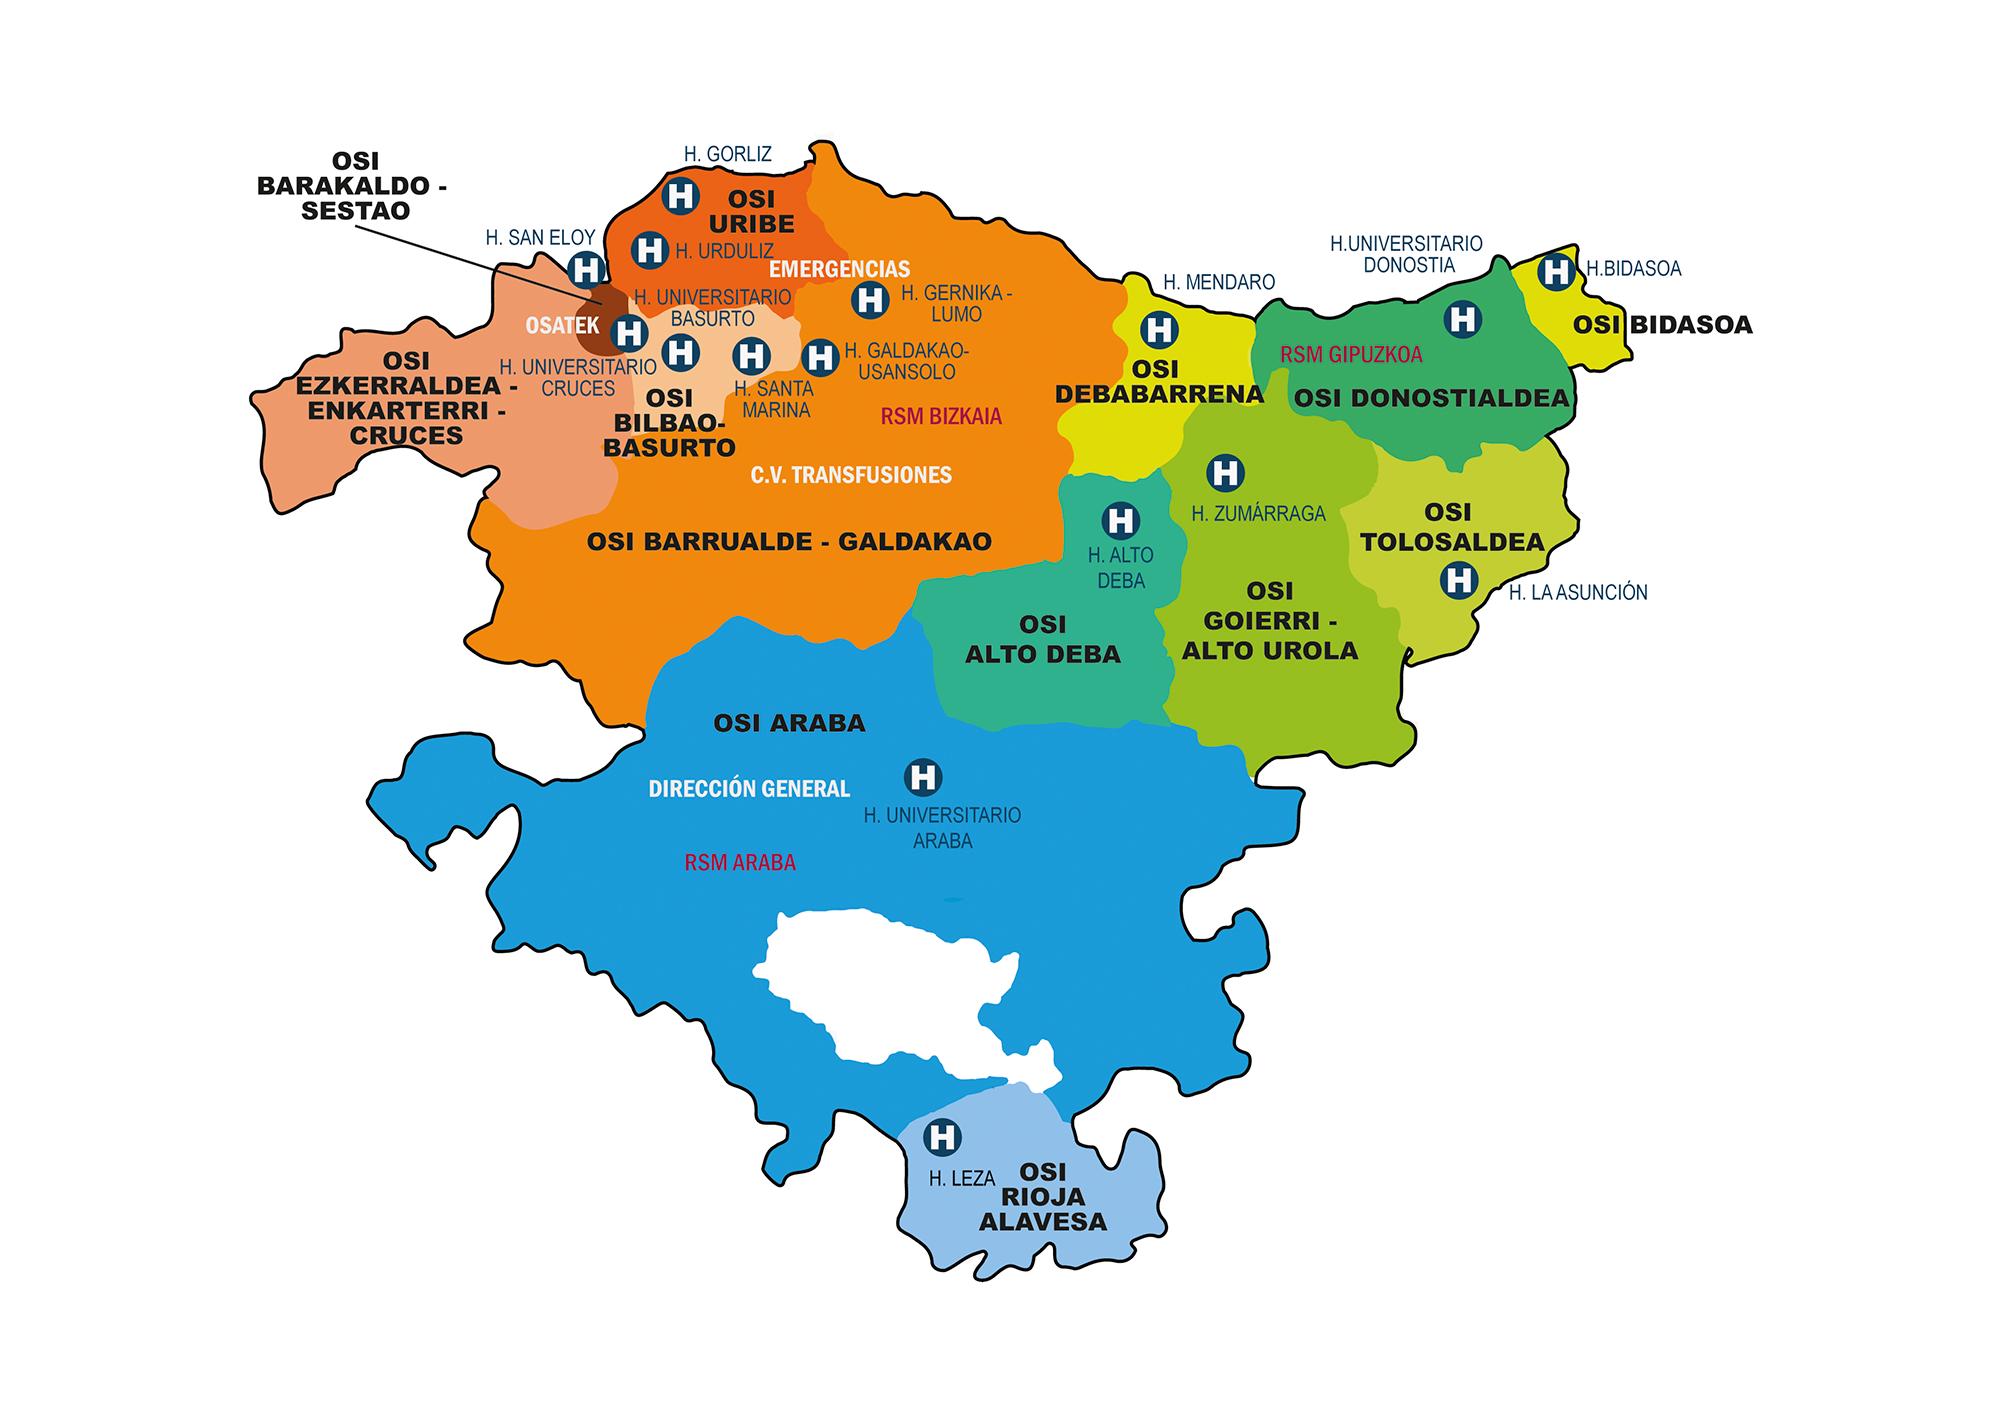 mapa_sistema_sanitario_vasco_es.png